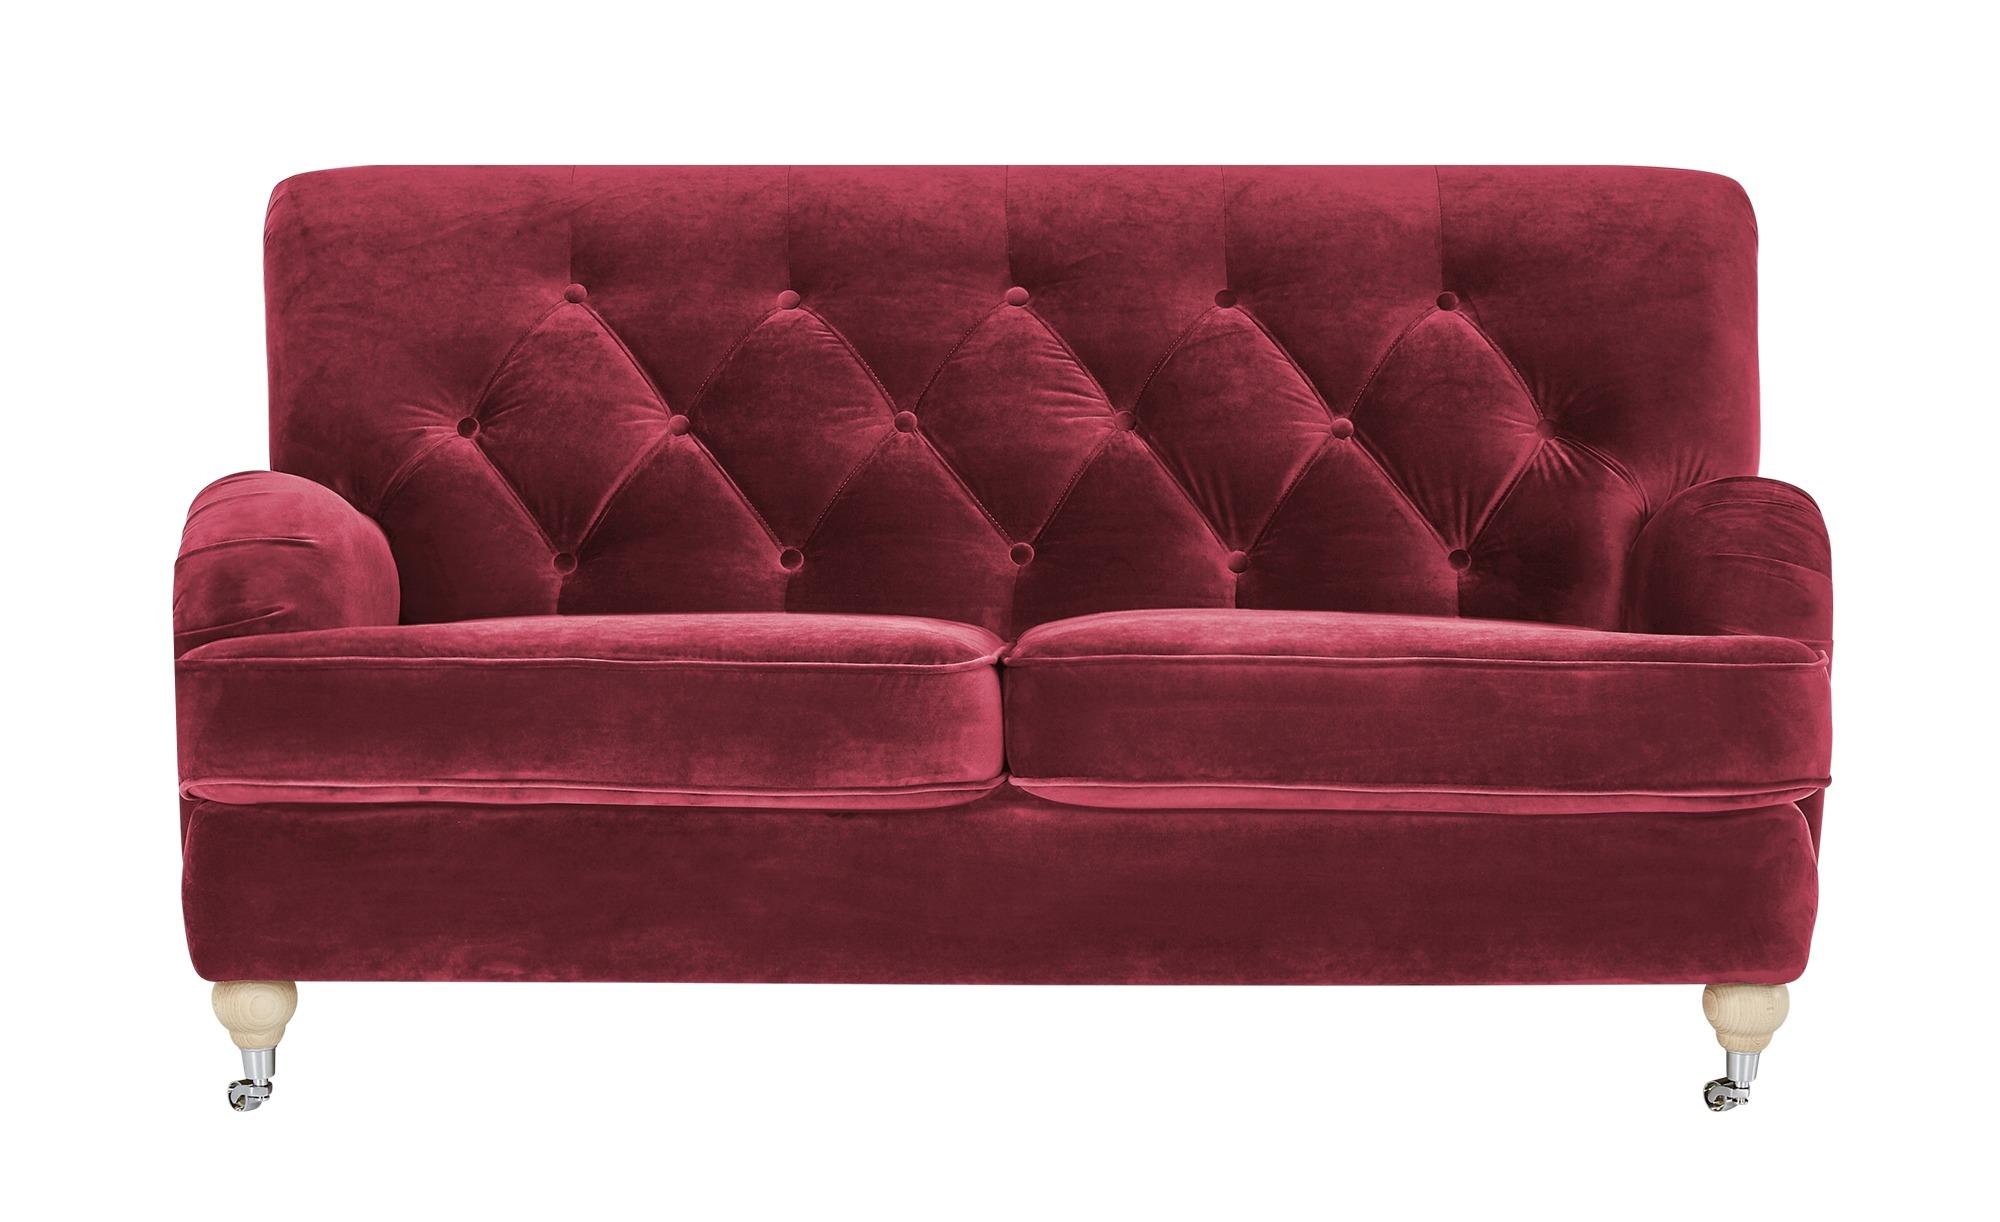 finya Sofa Samt Silva ¦ rot ¦ Maße (cm): B: 162 H: 87 T: 104 Polstermöbel > Sofas > 2-Sitzer - Höffner